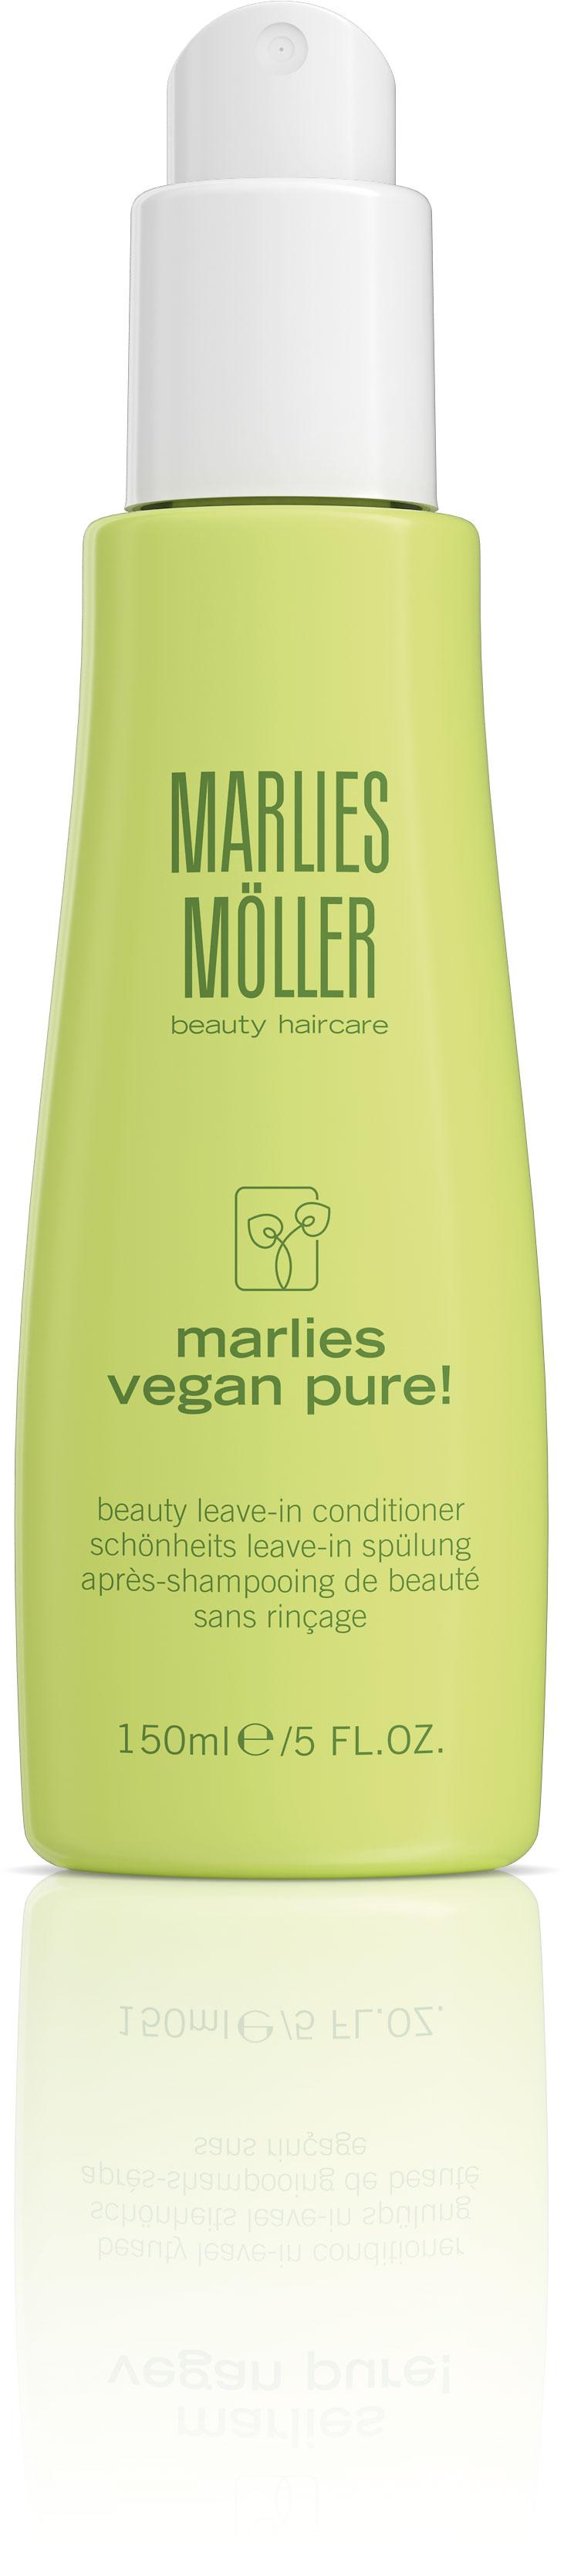 Marlies Möller Vegan Pure Beauty Leave In Condit 150 ml